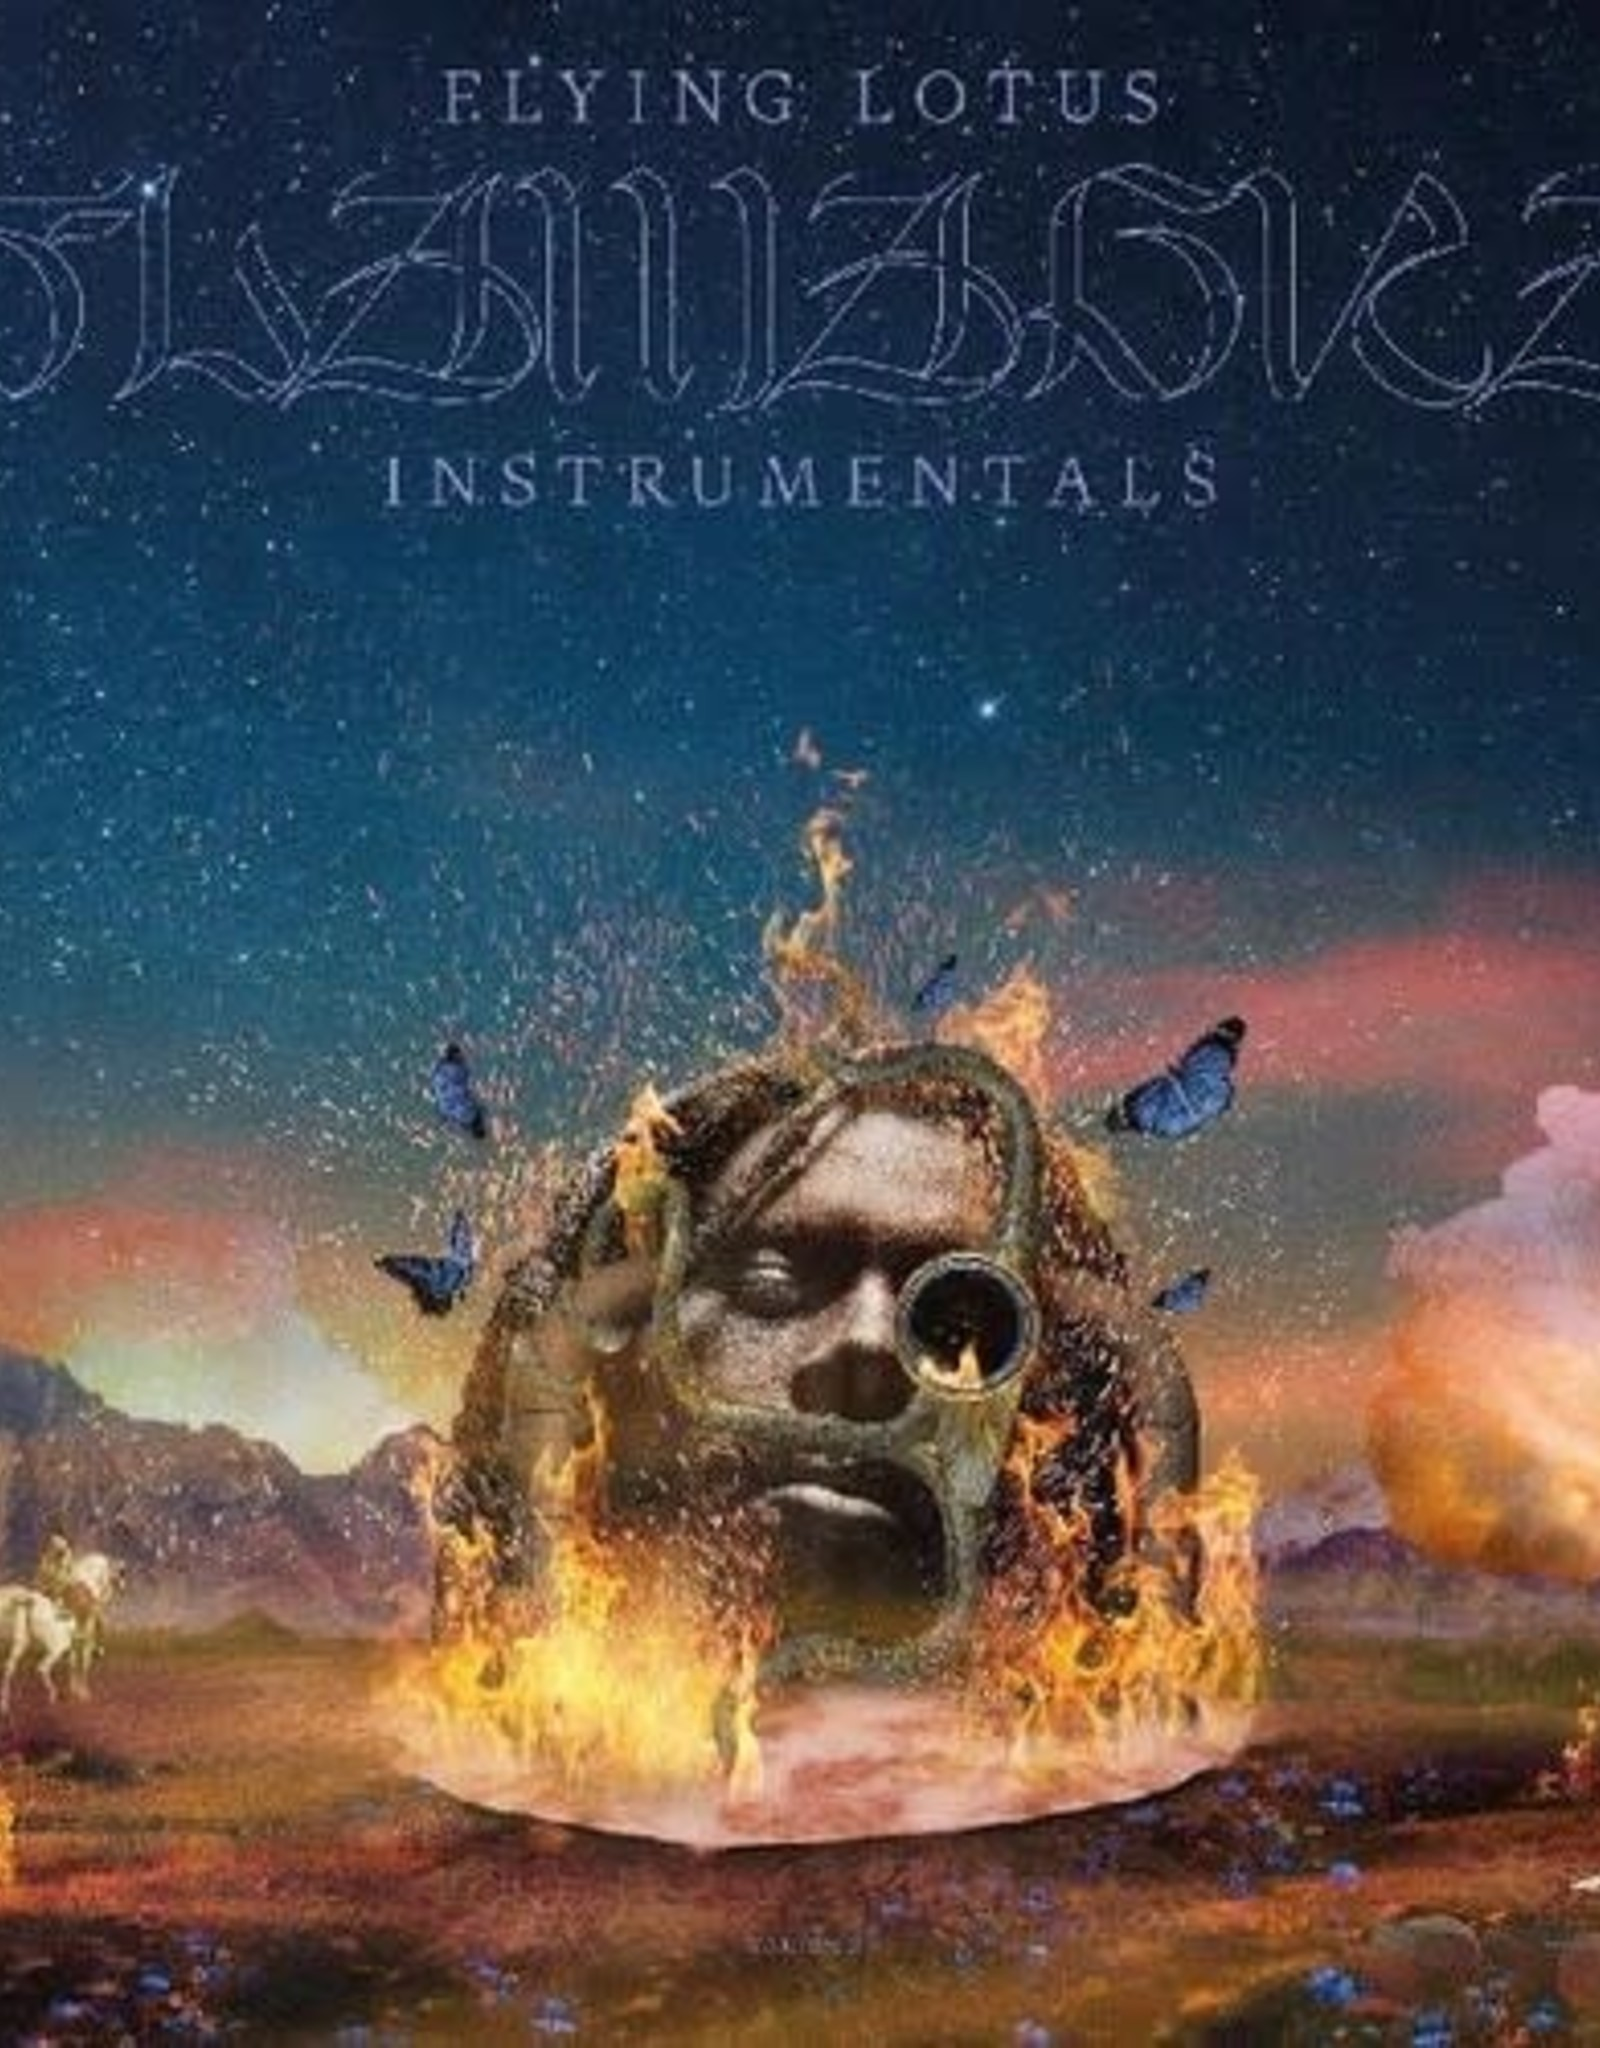 Flying Lotus - Flamagra (Instrumentals)